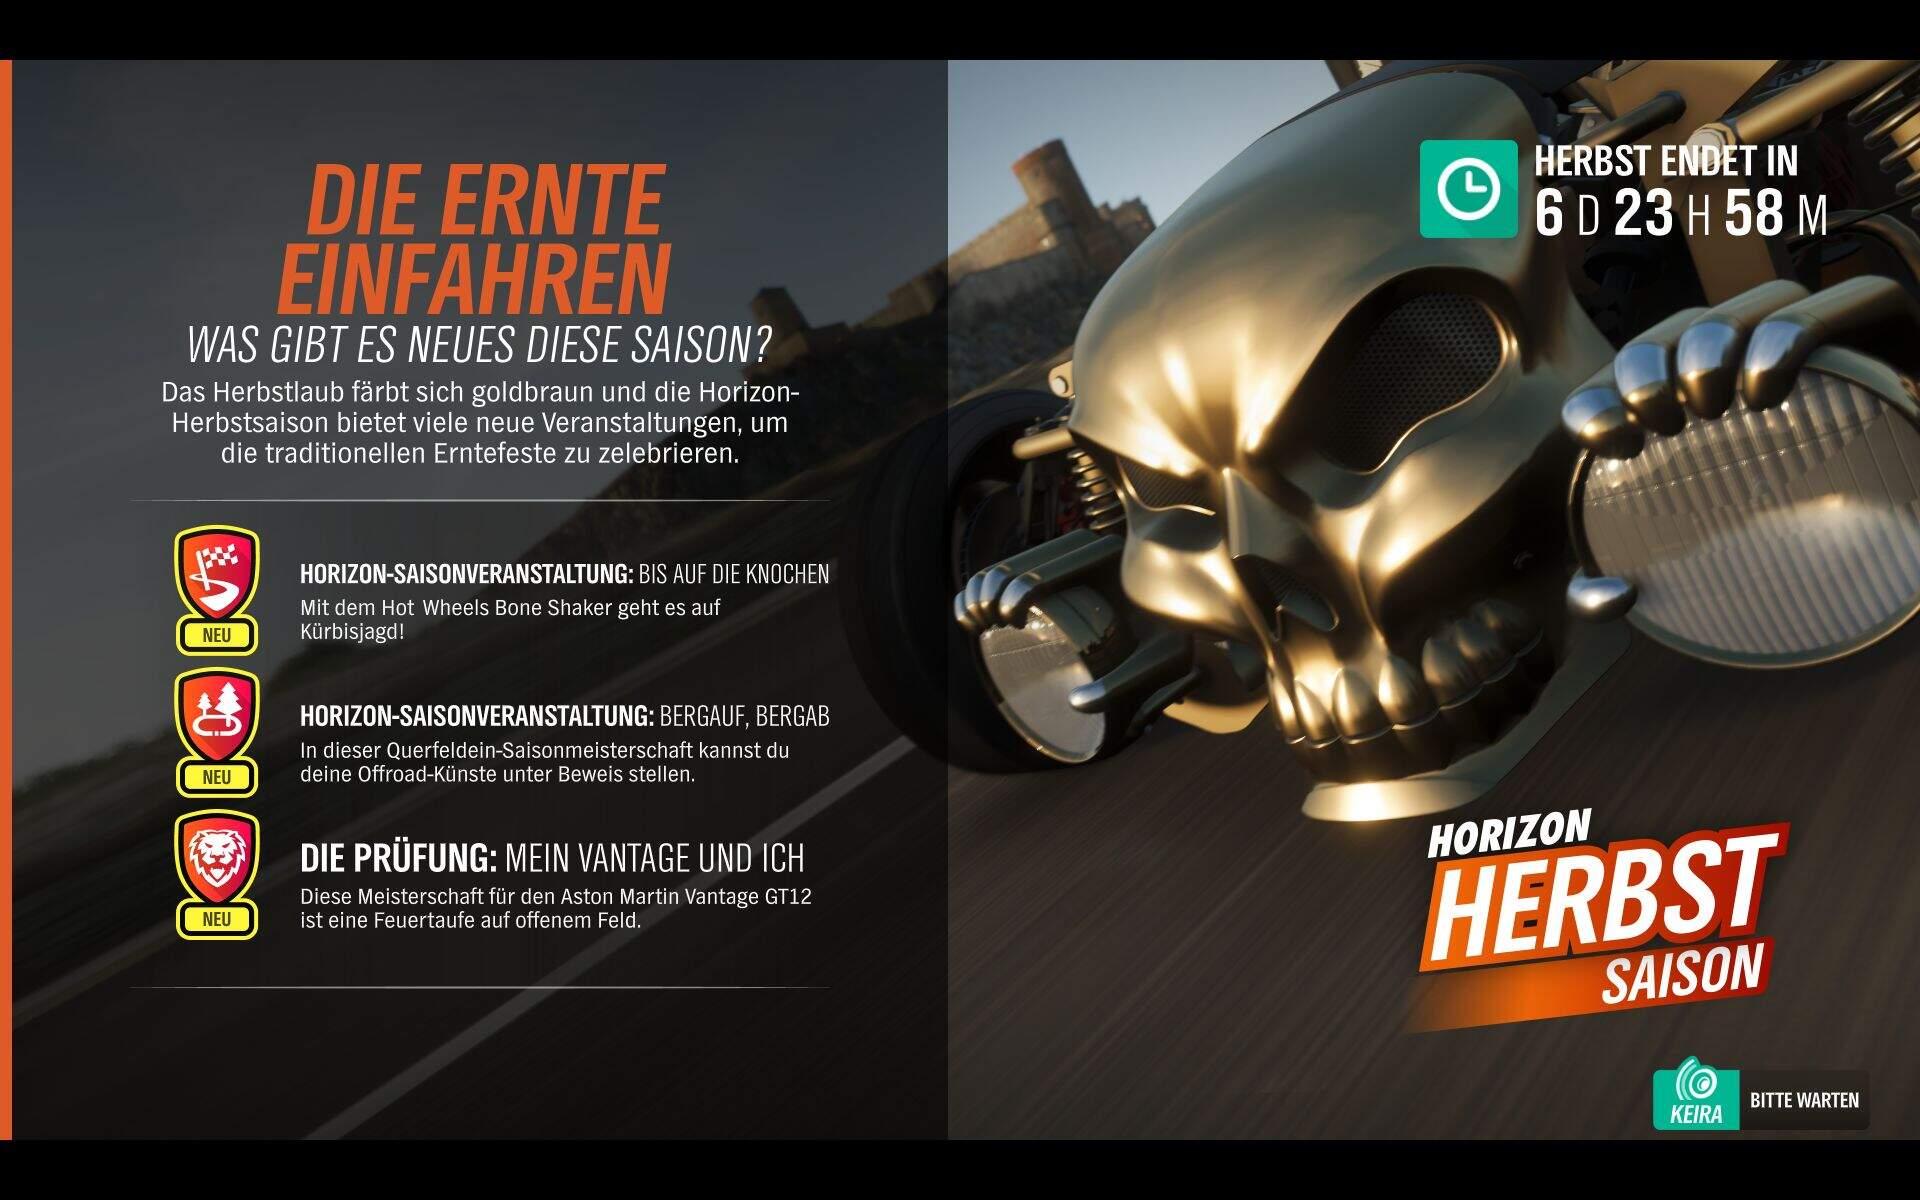 Forza Horizon 4 Herbst